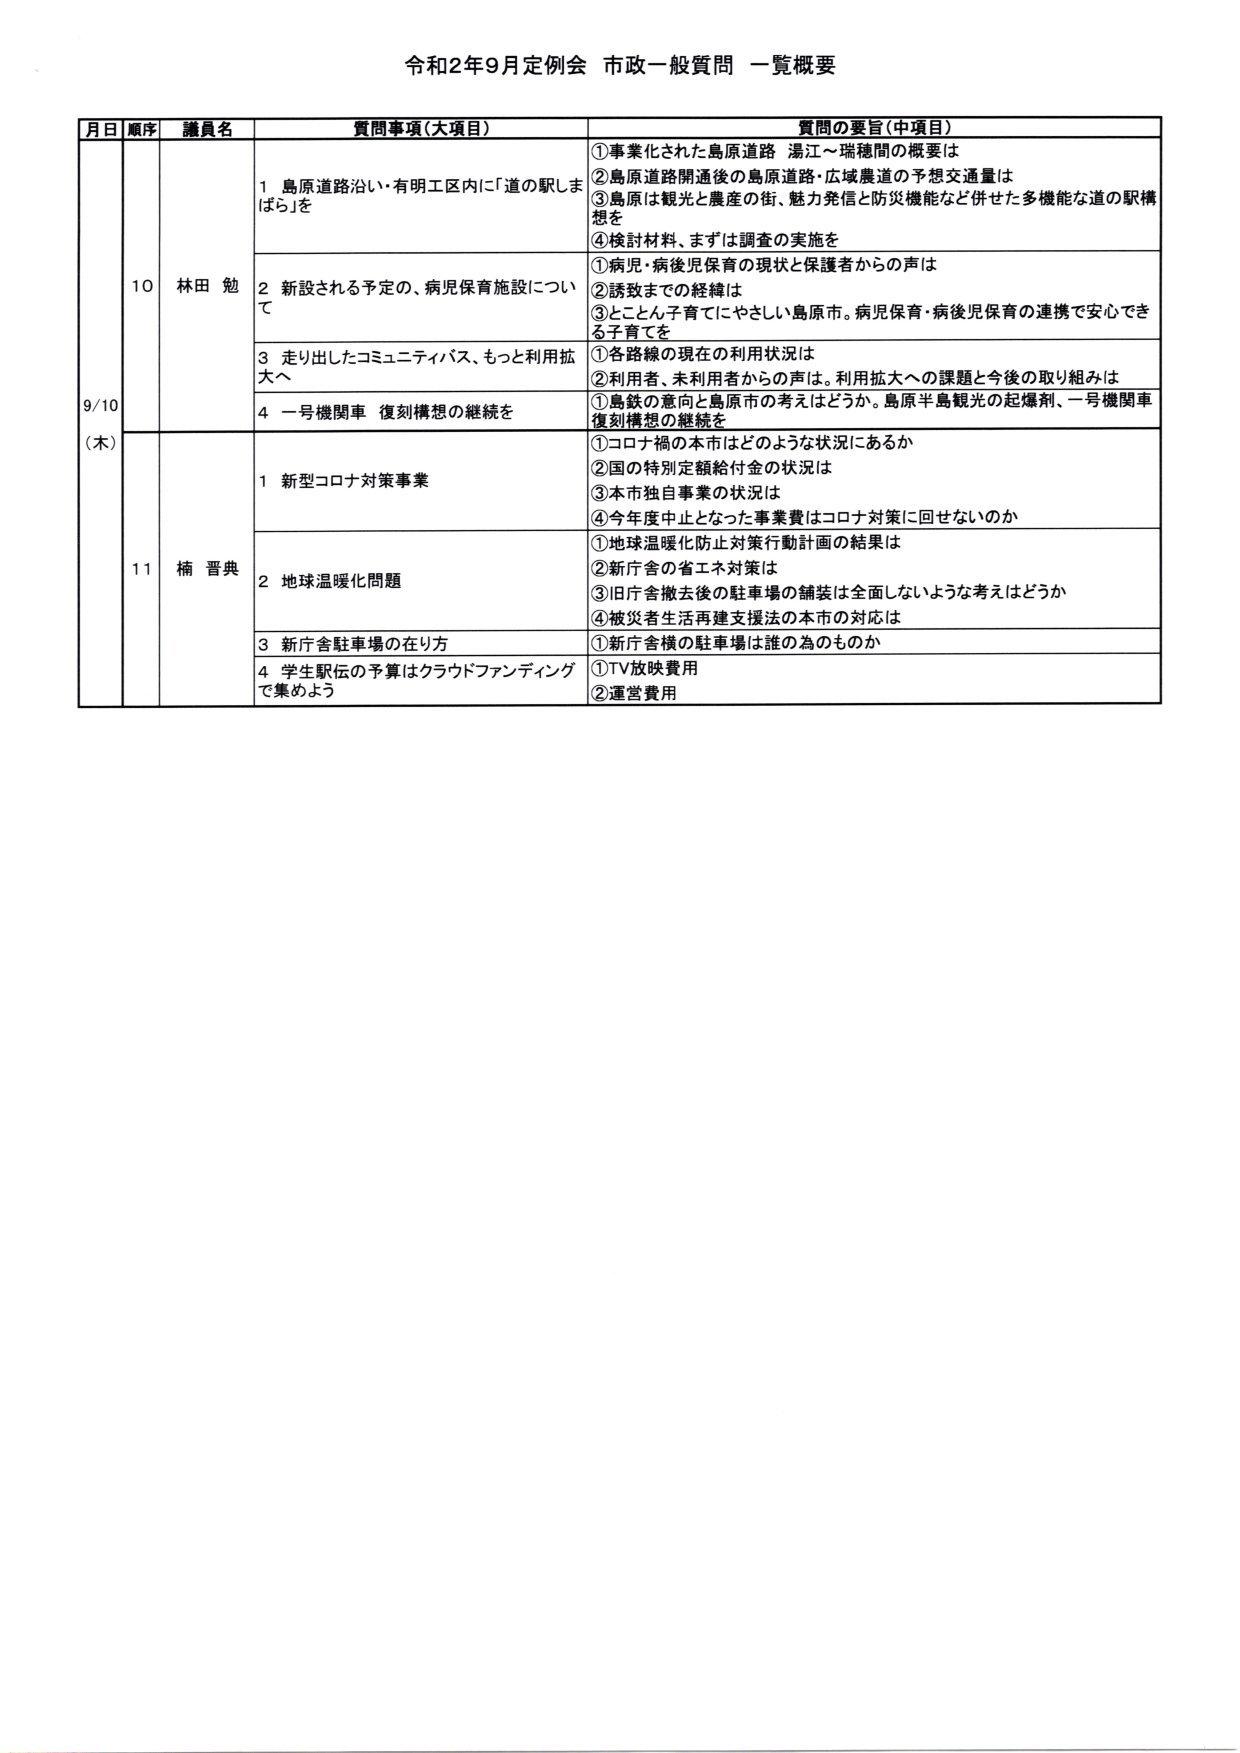 台風10号で議会日程変更_c0052876_11024124.jpg